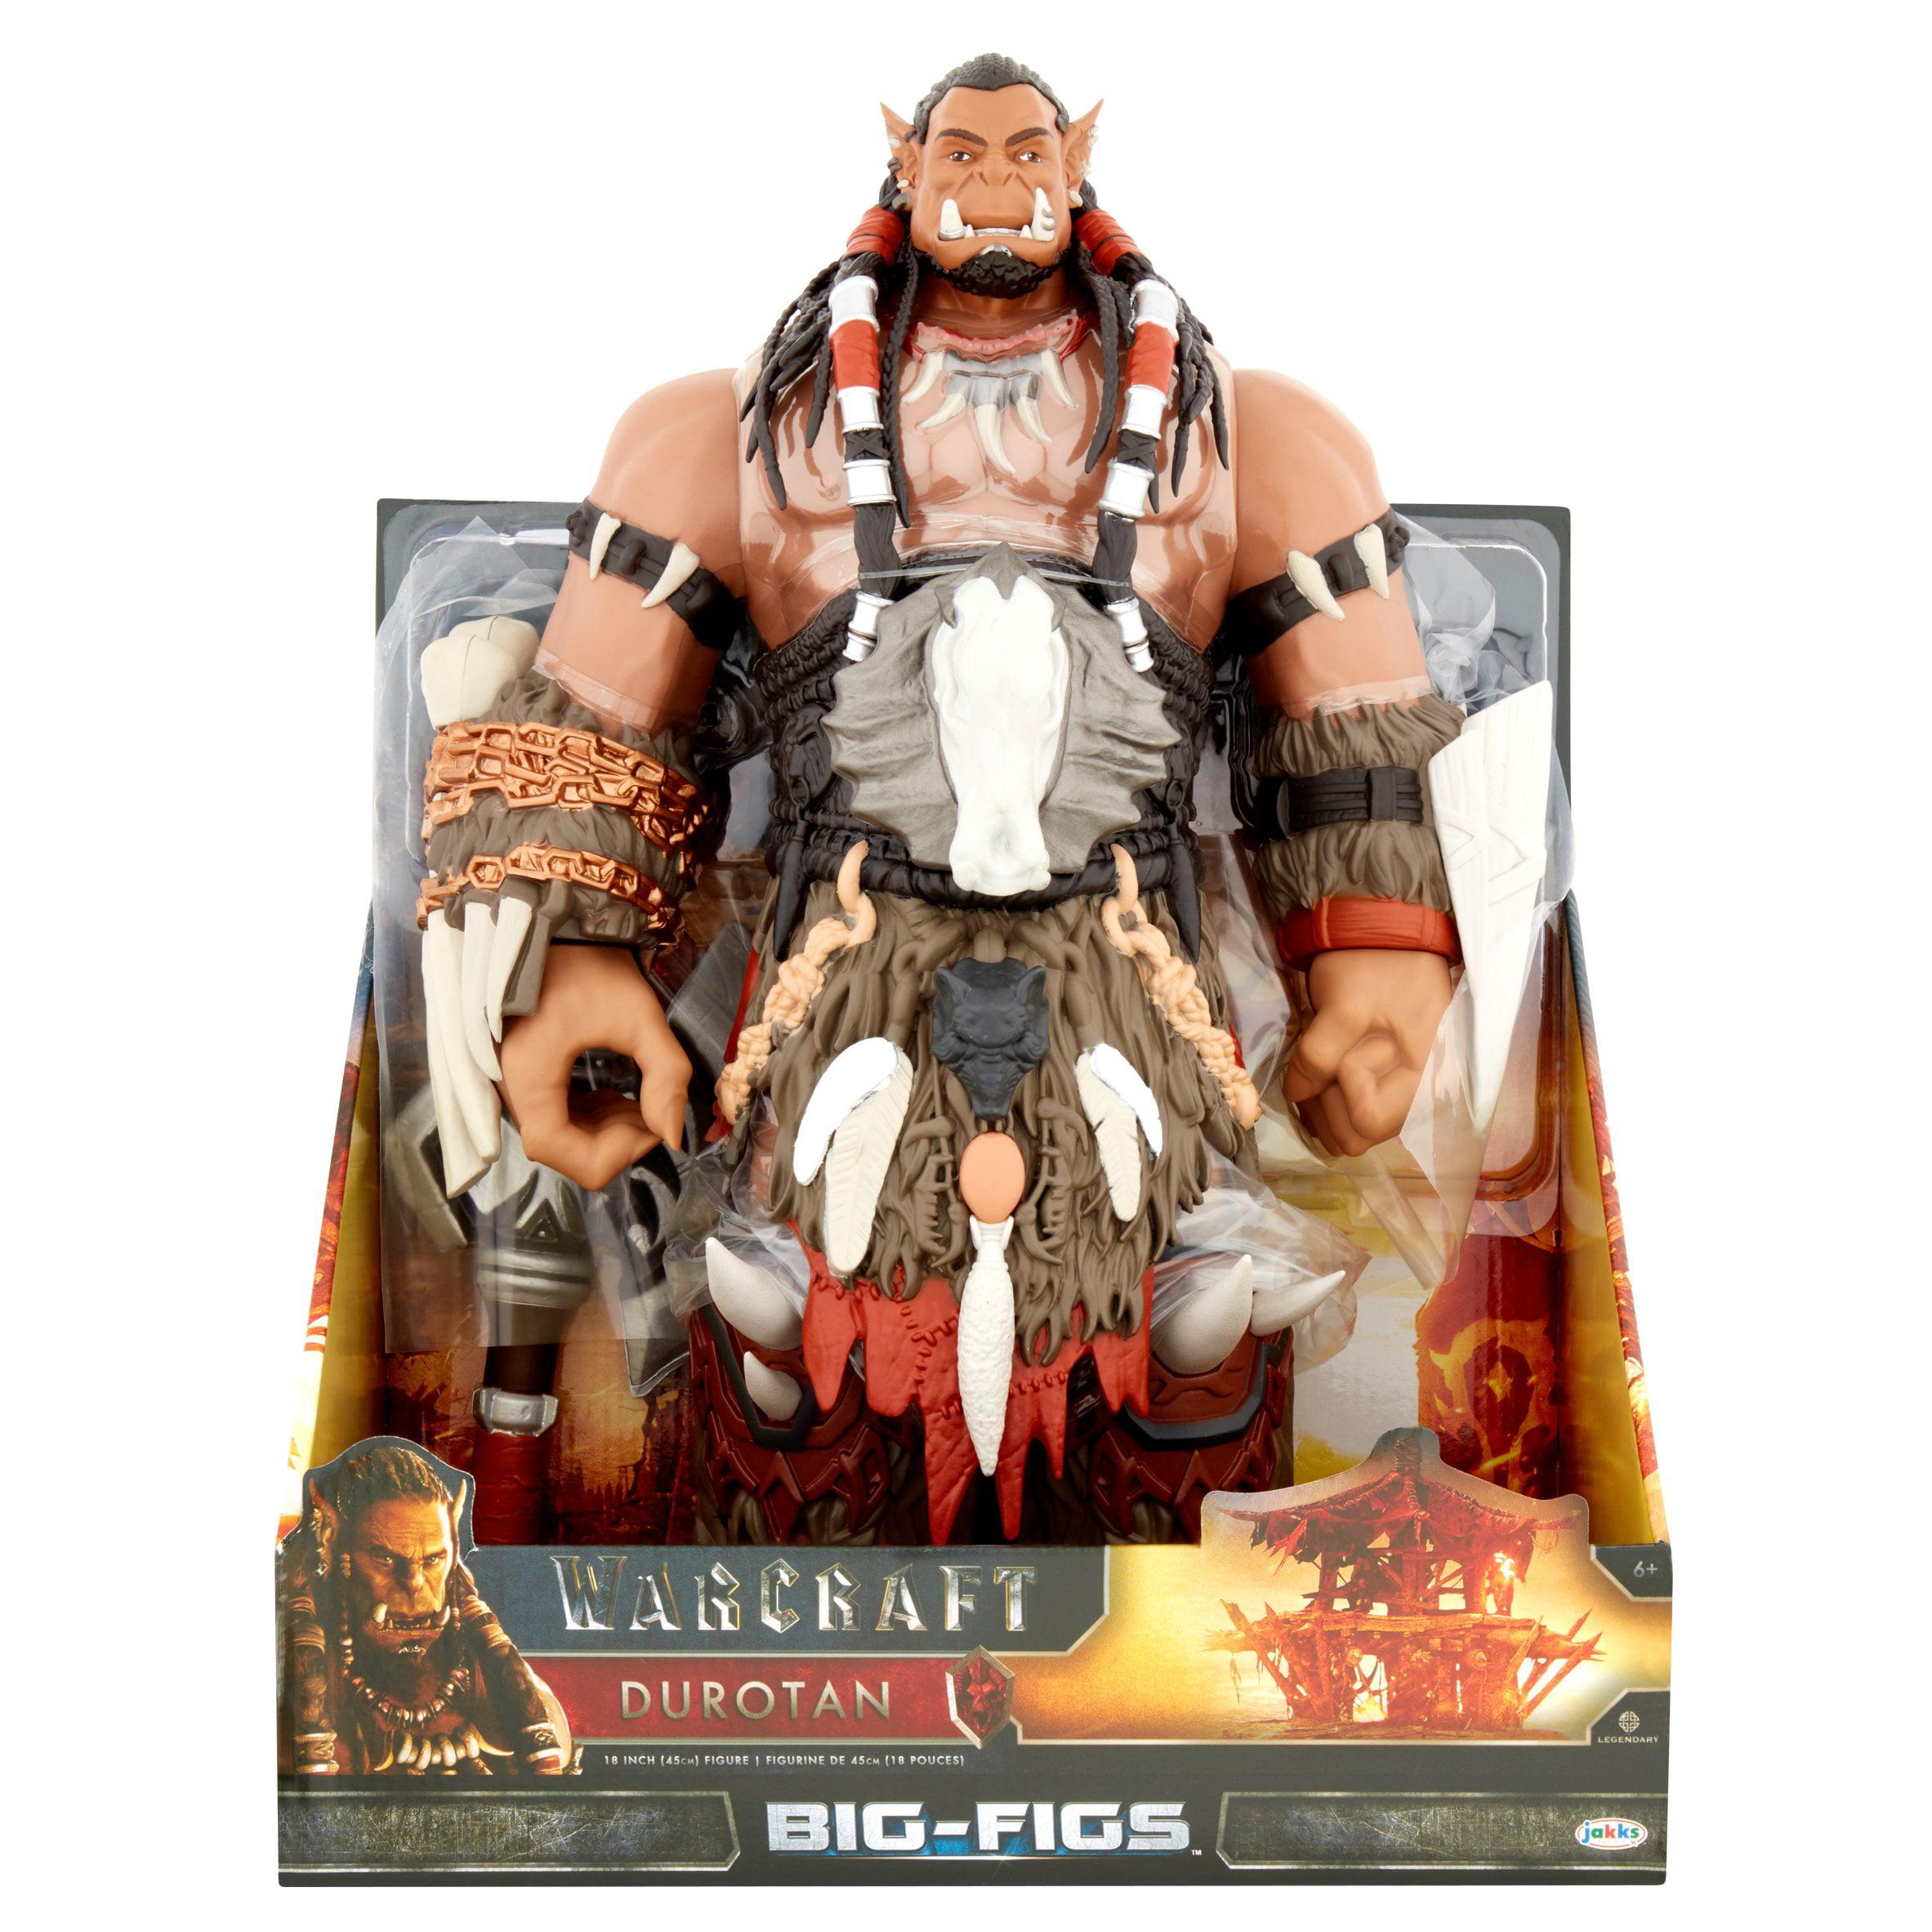 Jakks Pacific Big-Figs Warcraft Durotan Action Figure by Jakks Pacific, Inc.